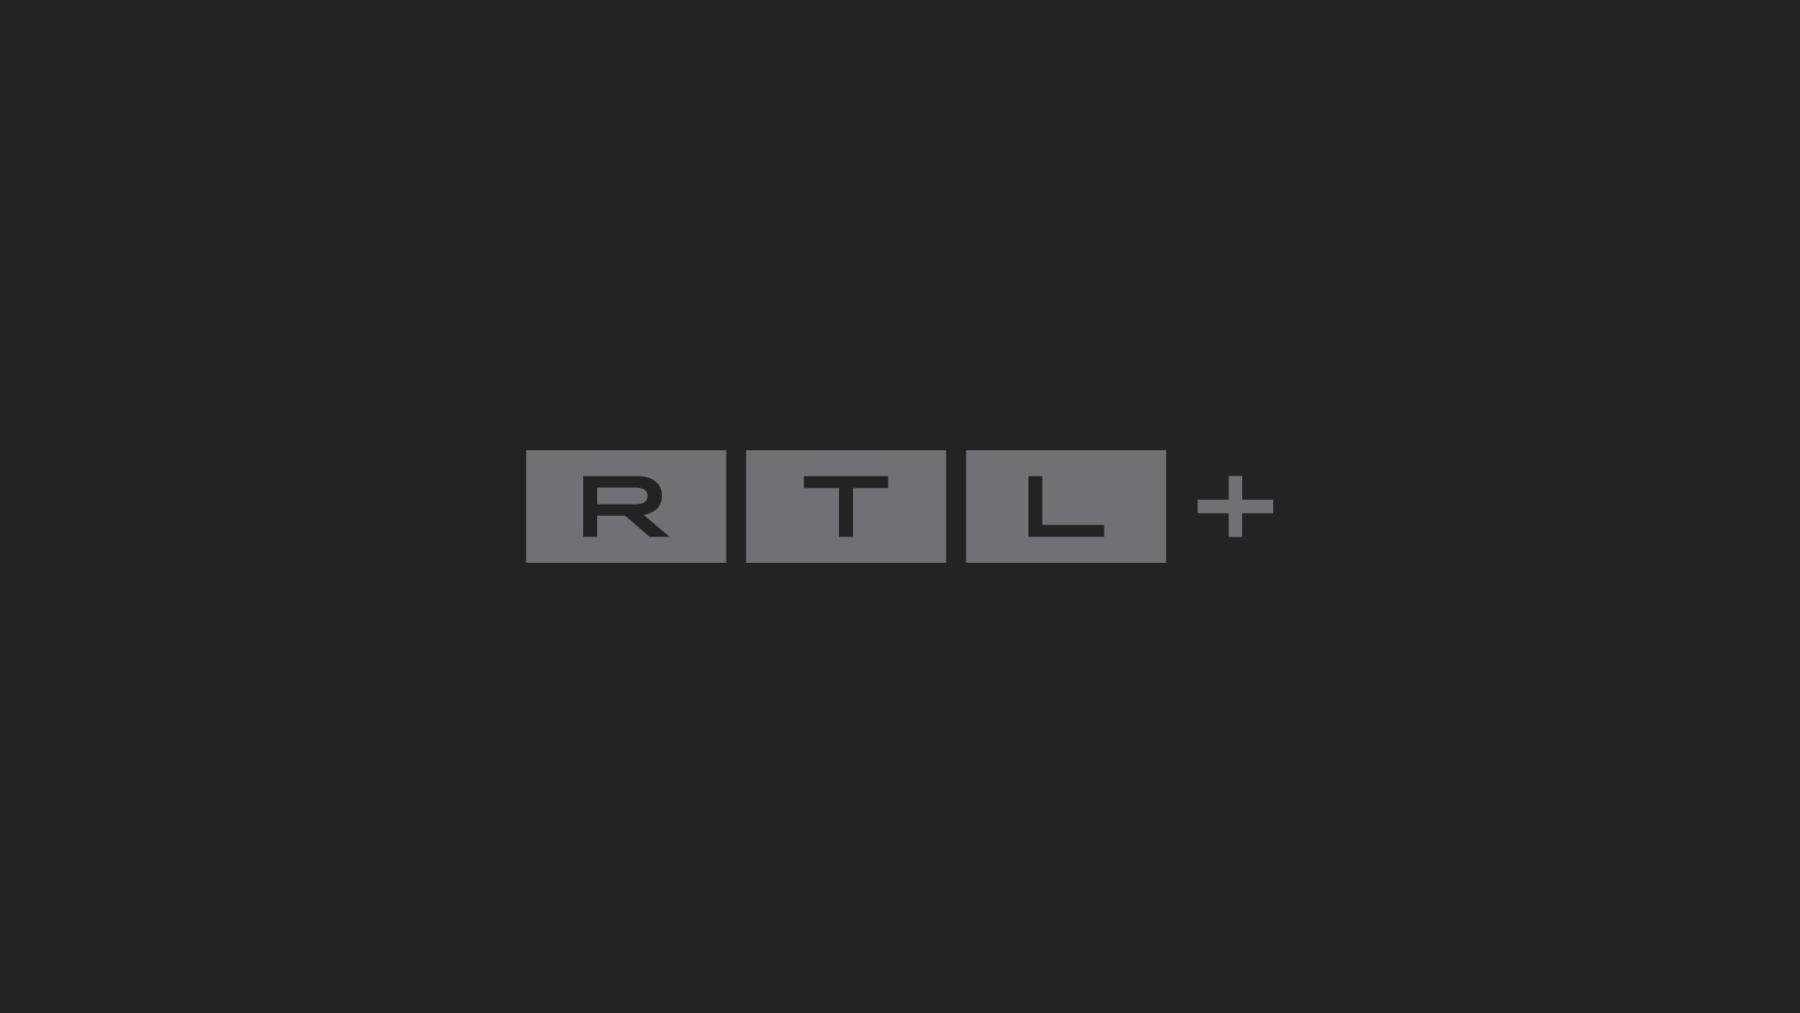 Der Oklahoma Bomber Timothy McVeigh